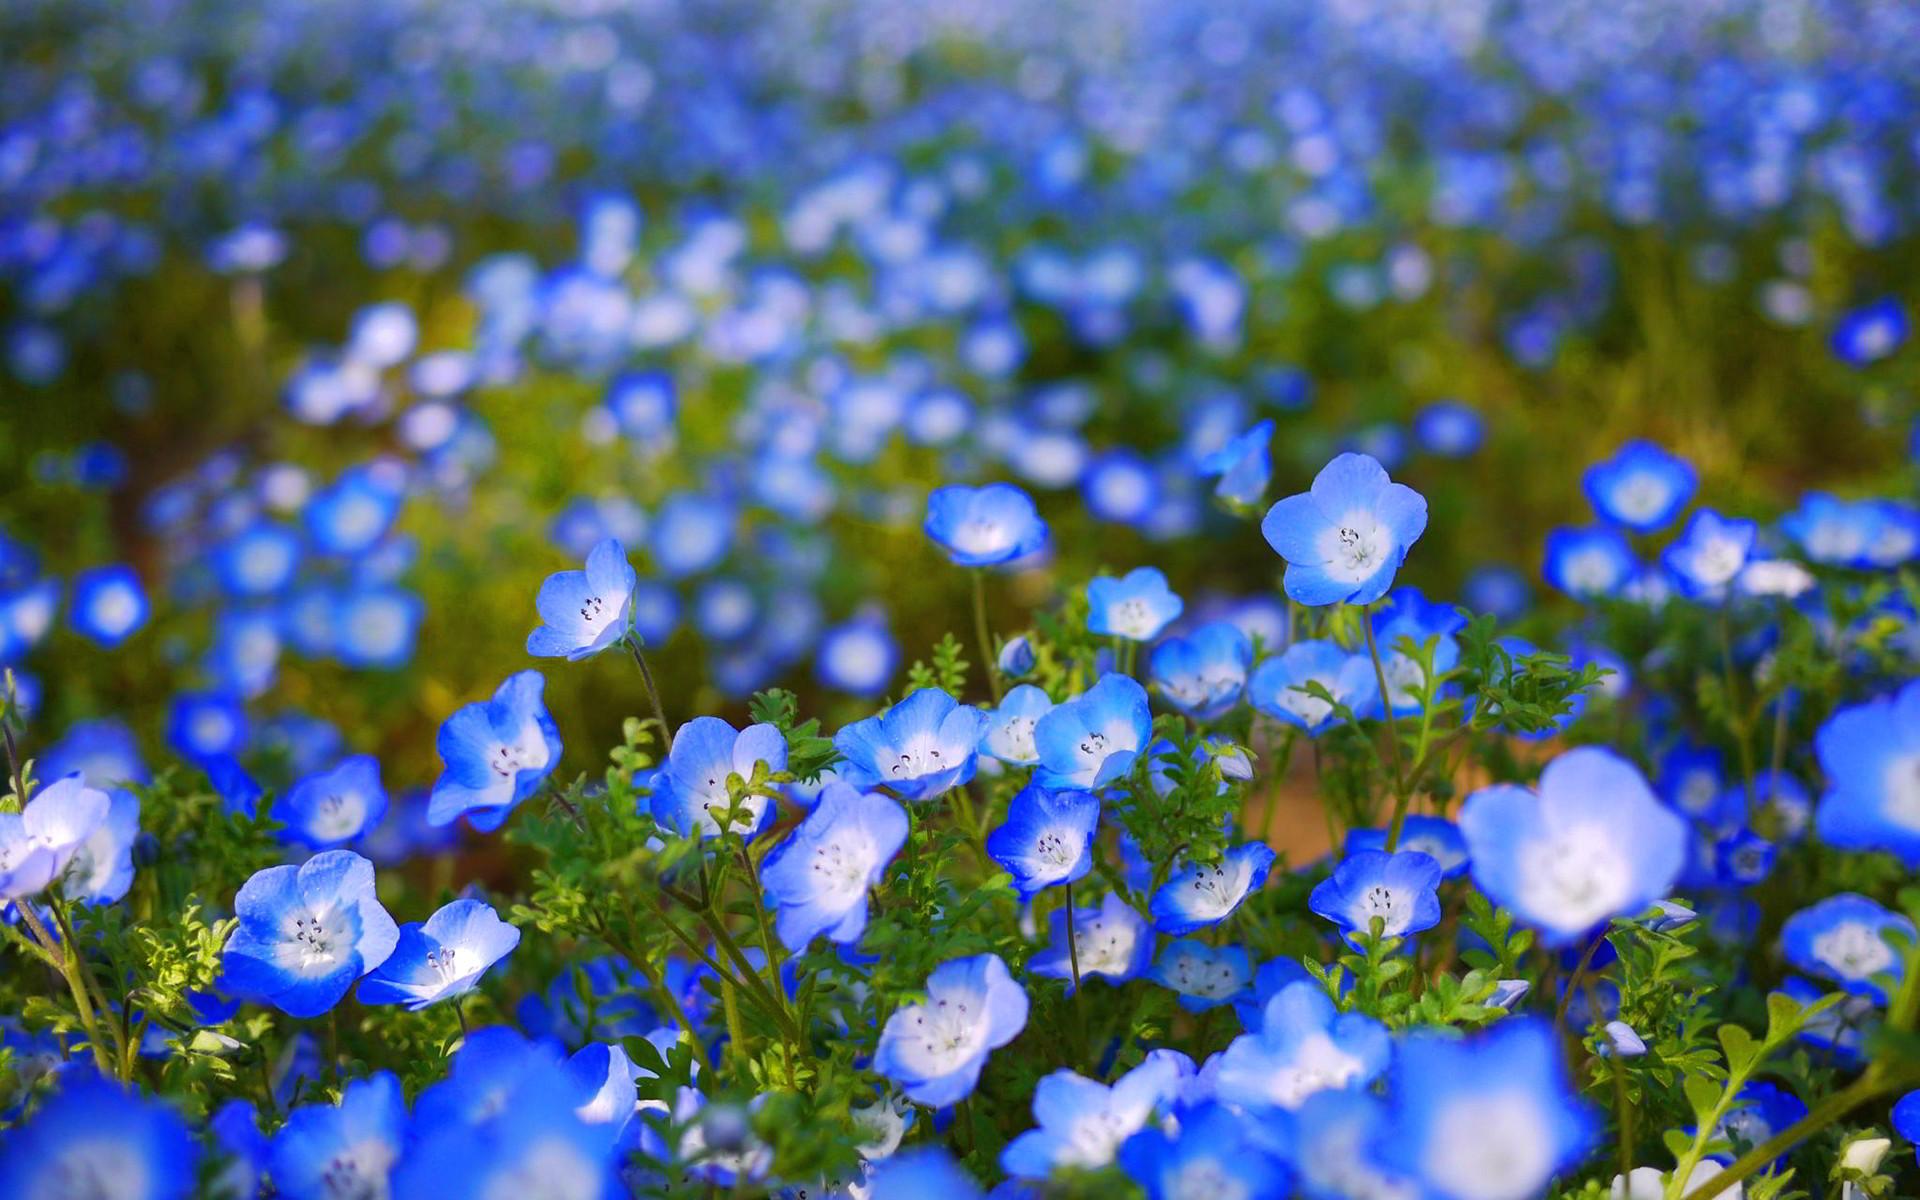 Blue Flower Wallpaper 1080p …